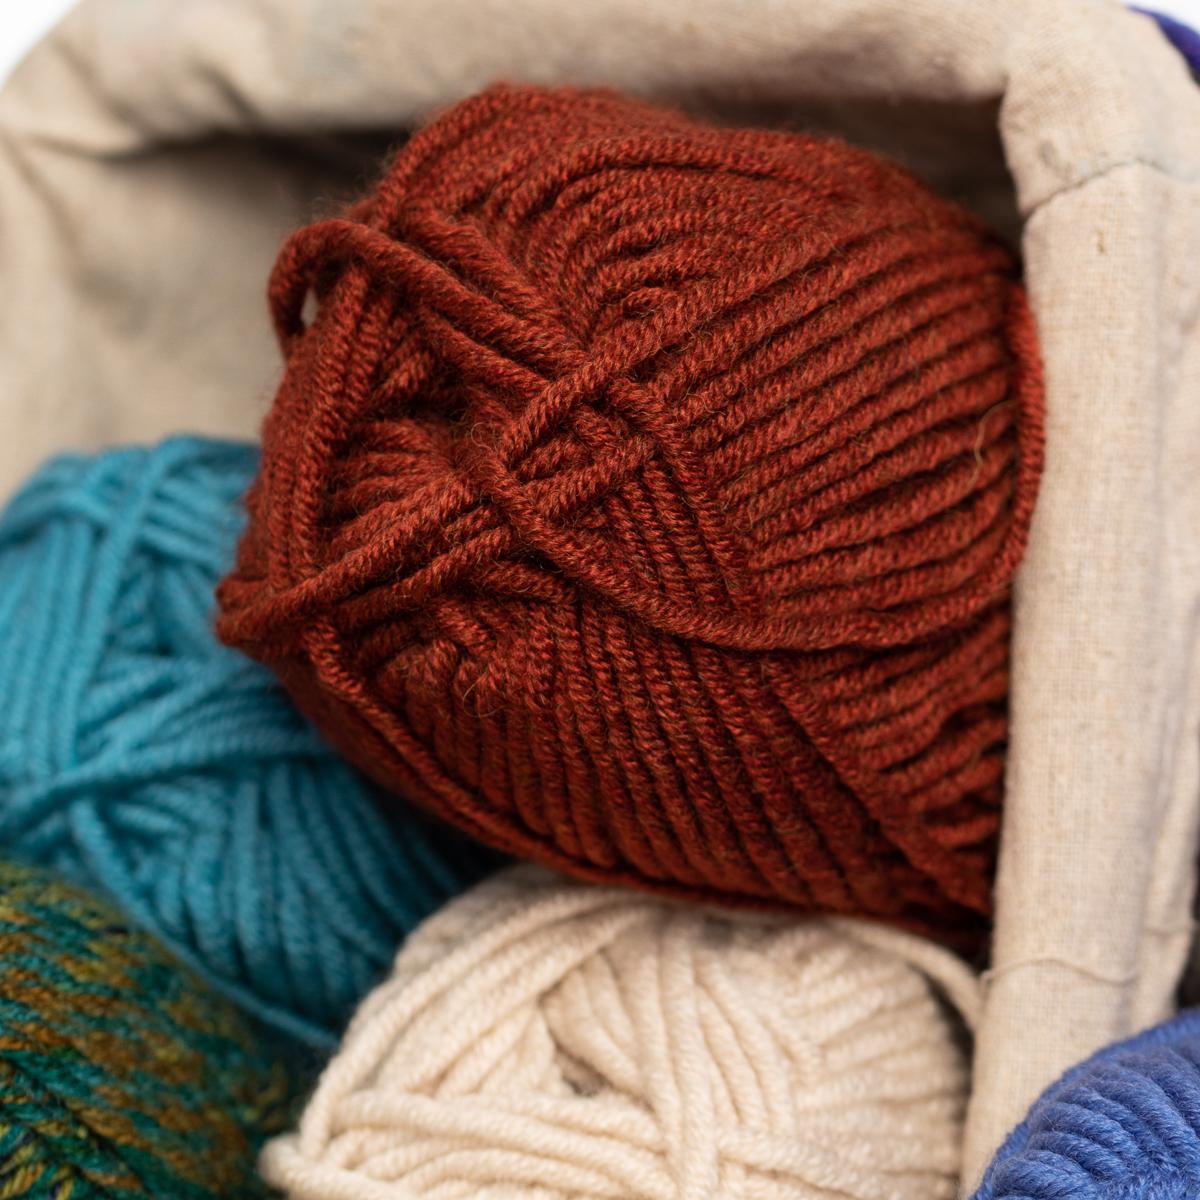 3pk-Lion-Brand-Woolspun-Acrylic-amp-Wool-Yarn-Bulky-5-Knit-Crocheting-Skeins-Soft thumbnail 94